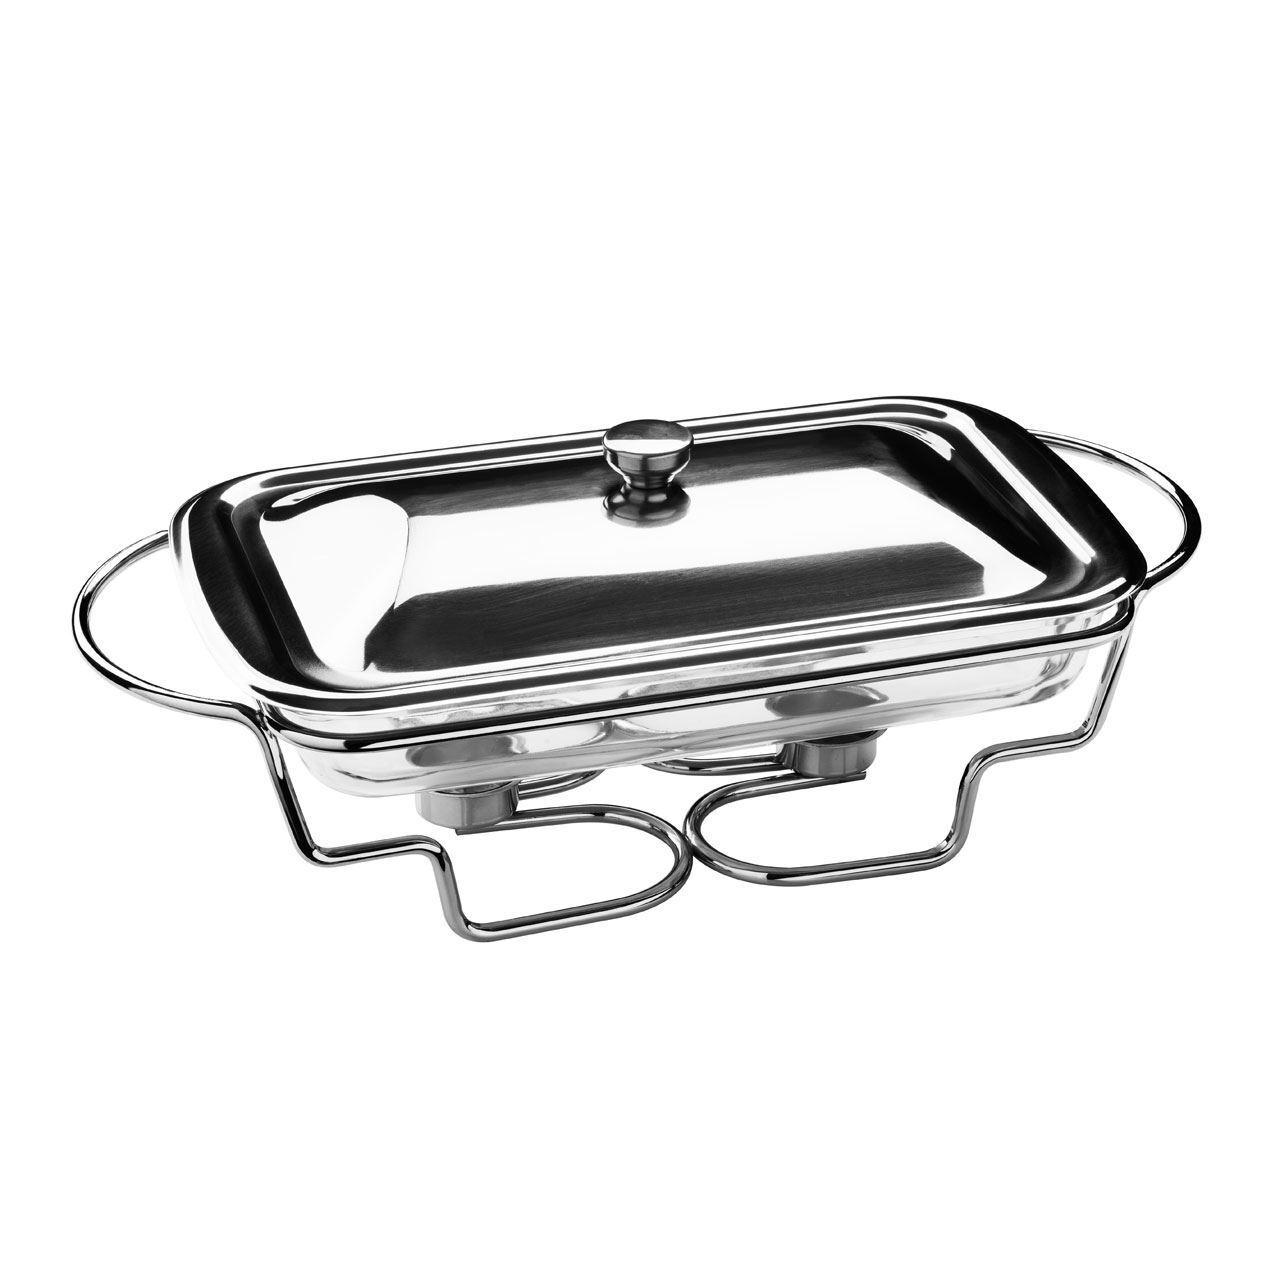 Food Warmer, 2.2 Ltr Marinex Glass Dish, Stainless Steel